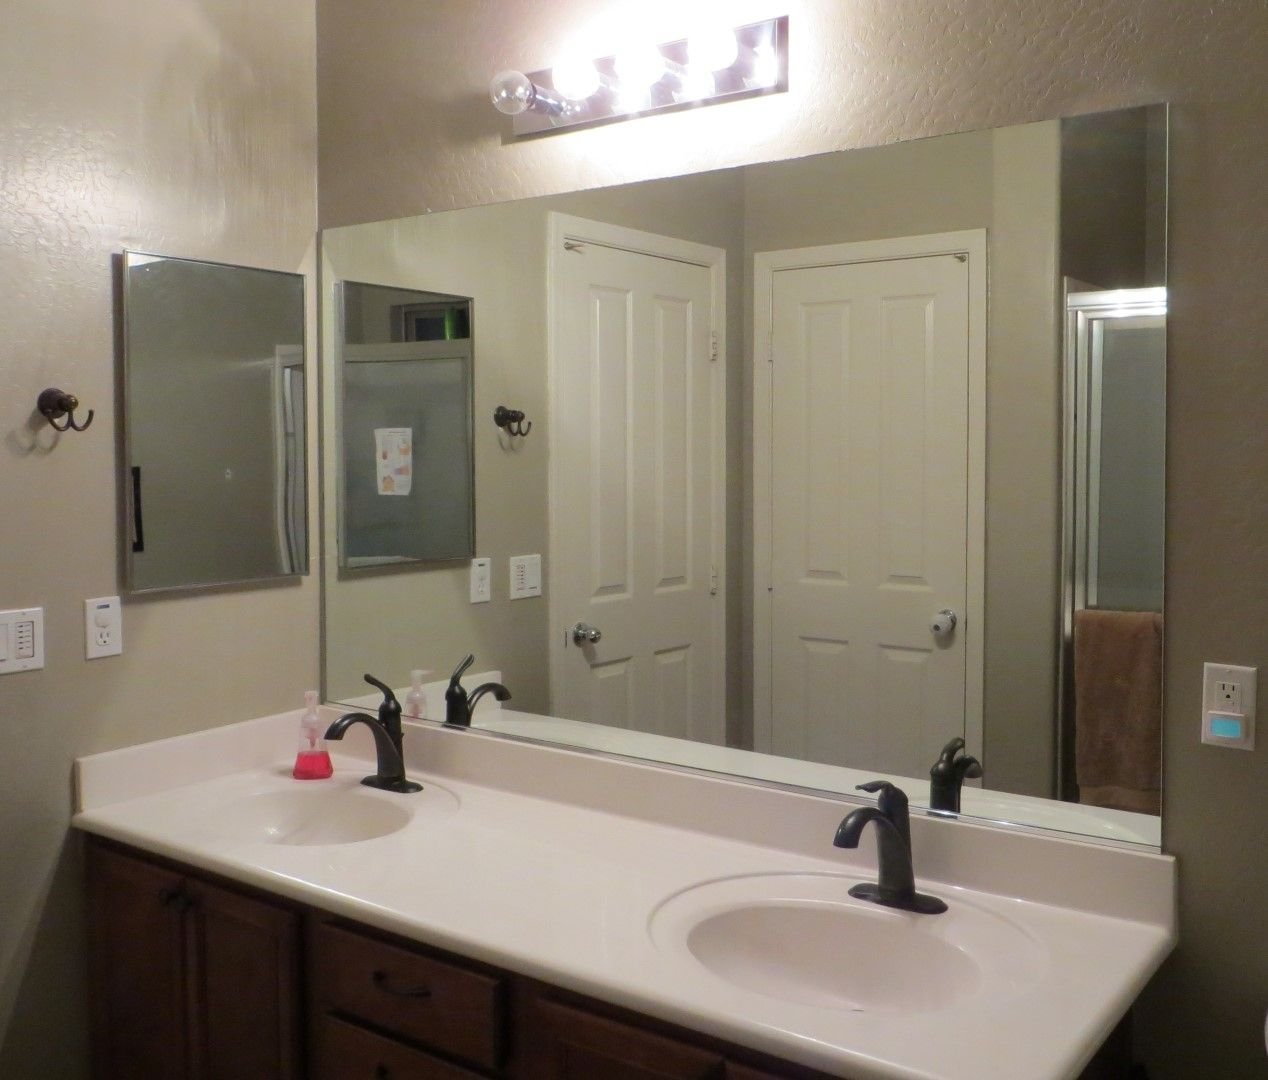 how to frame a mirror diy bathroom mirror frames tutorial - Diy Bathroom Mirror Frame